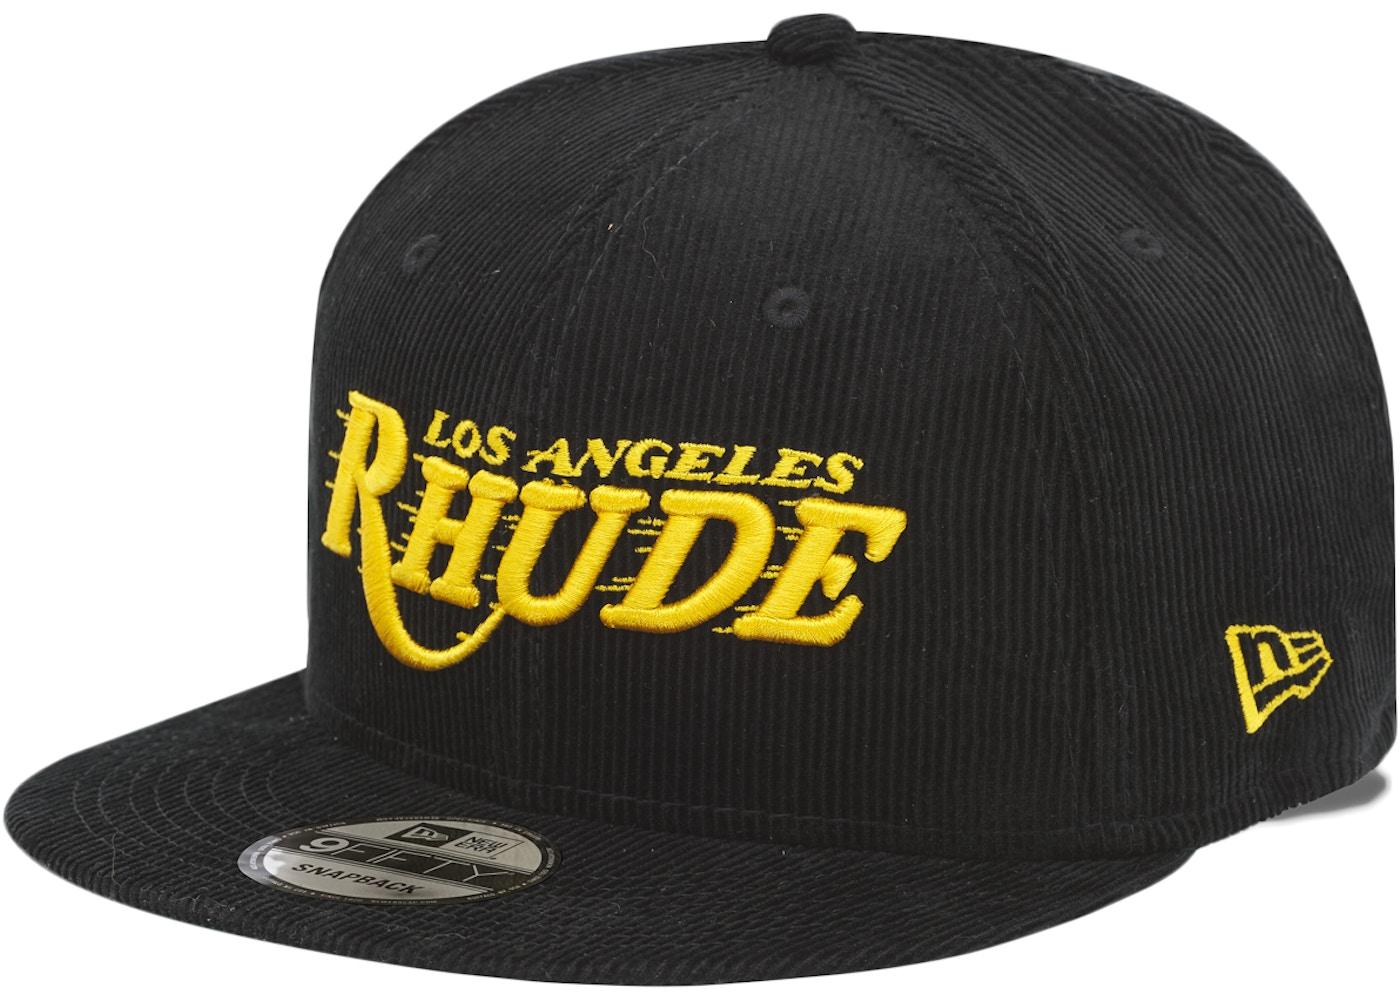 Rhude X Los Angeles Lakers New Era Dreamers Hat Black Gold Fw20